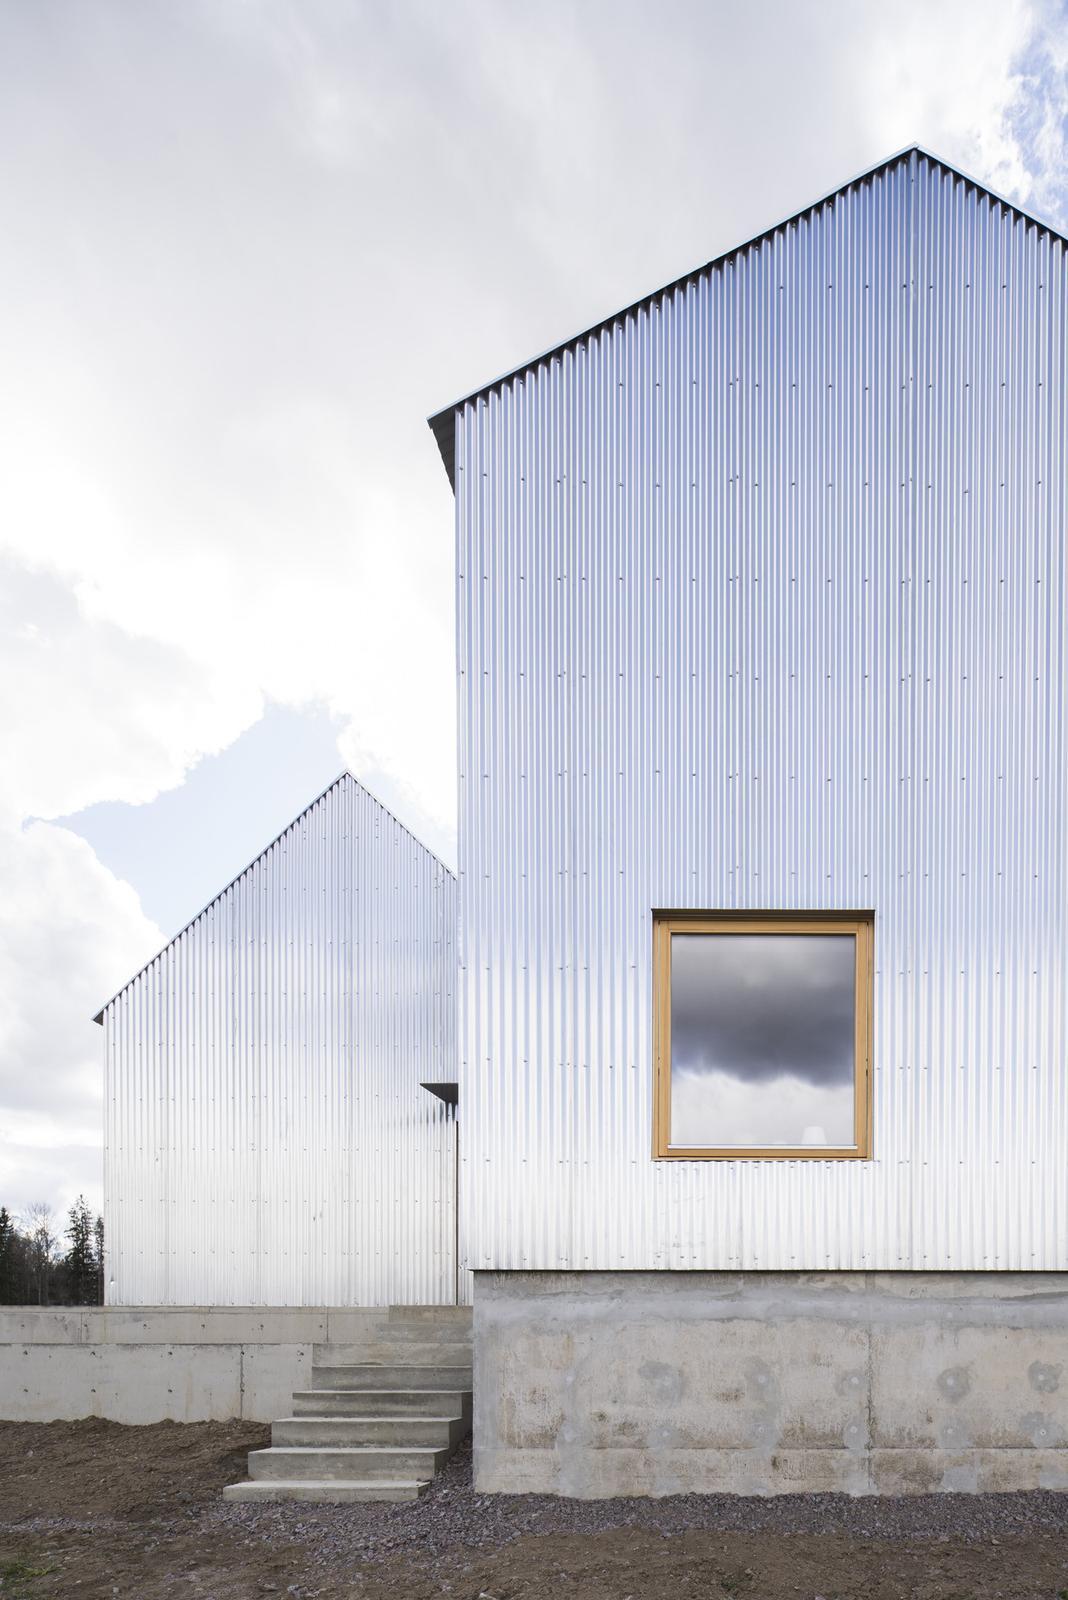 House for Mother by Förstberg Ling - Obrázok č. 2